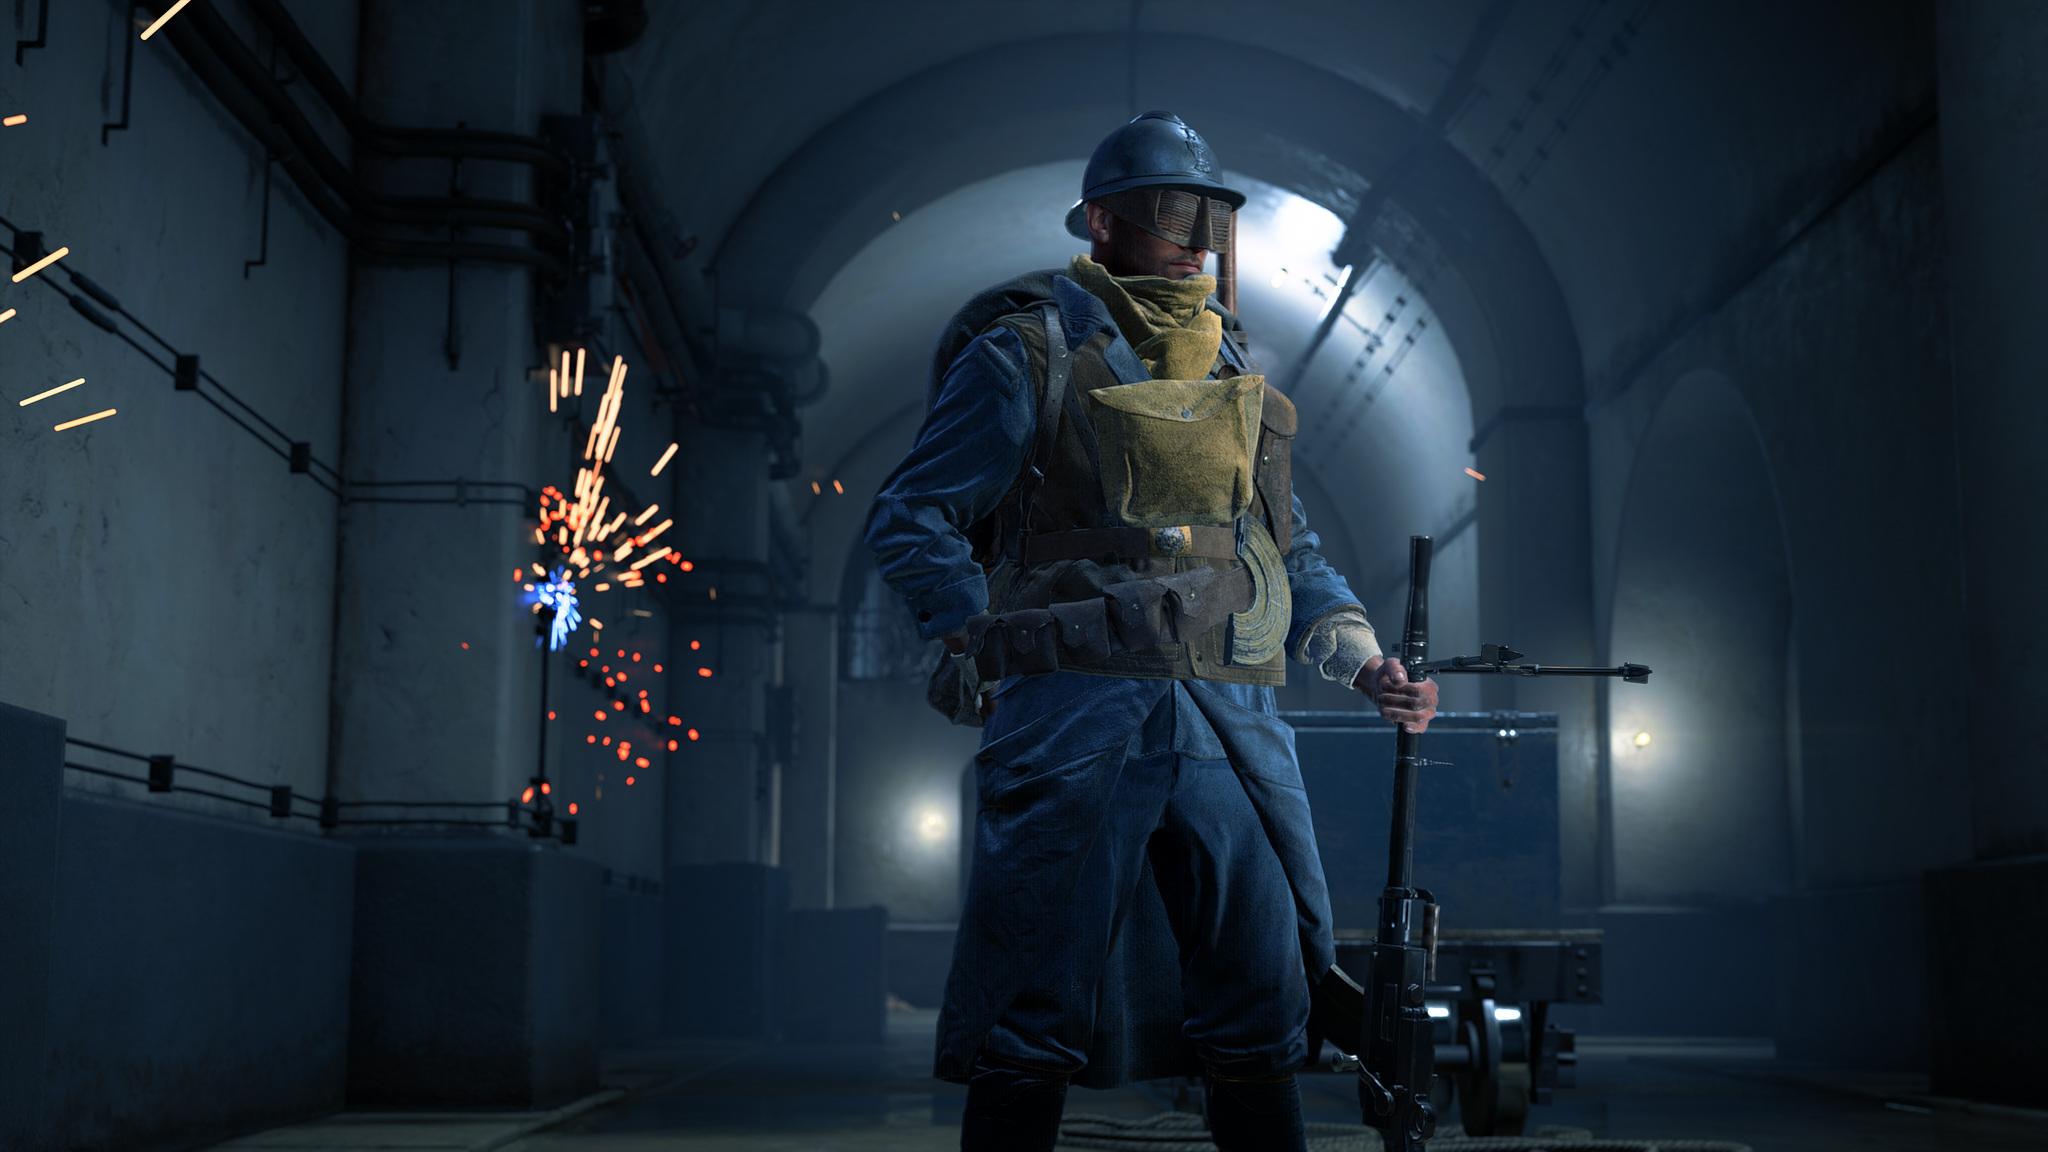 2048x1152 Battlefield 1 Solider 5k 2048x1152 Resolution HD